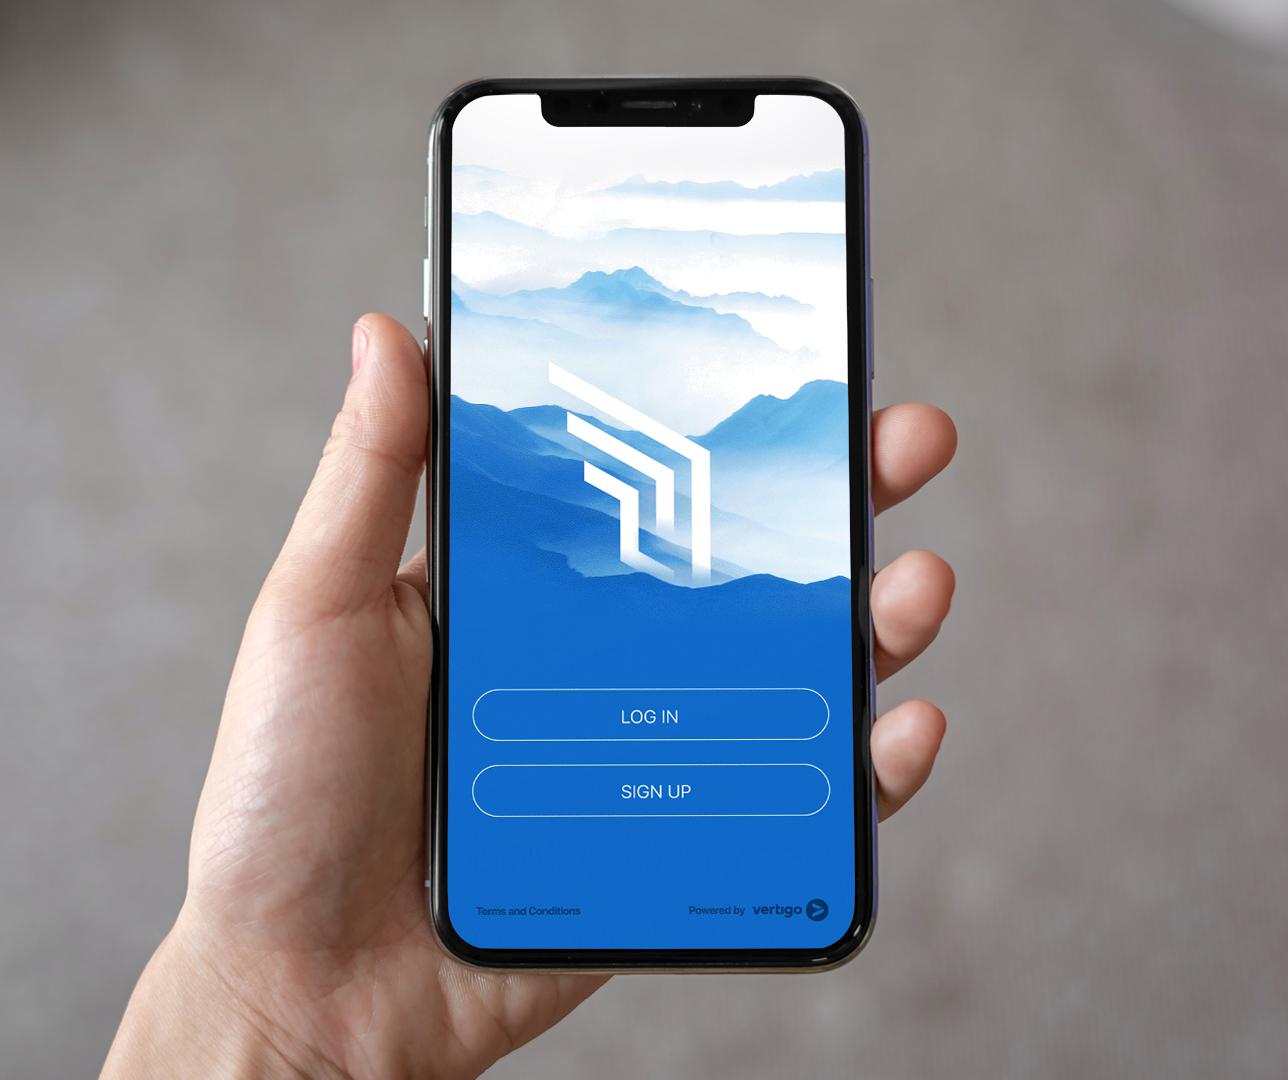 iphone-ghost-hand.jpg